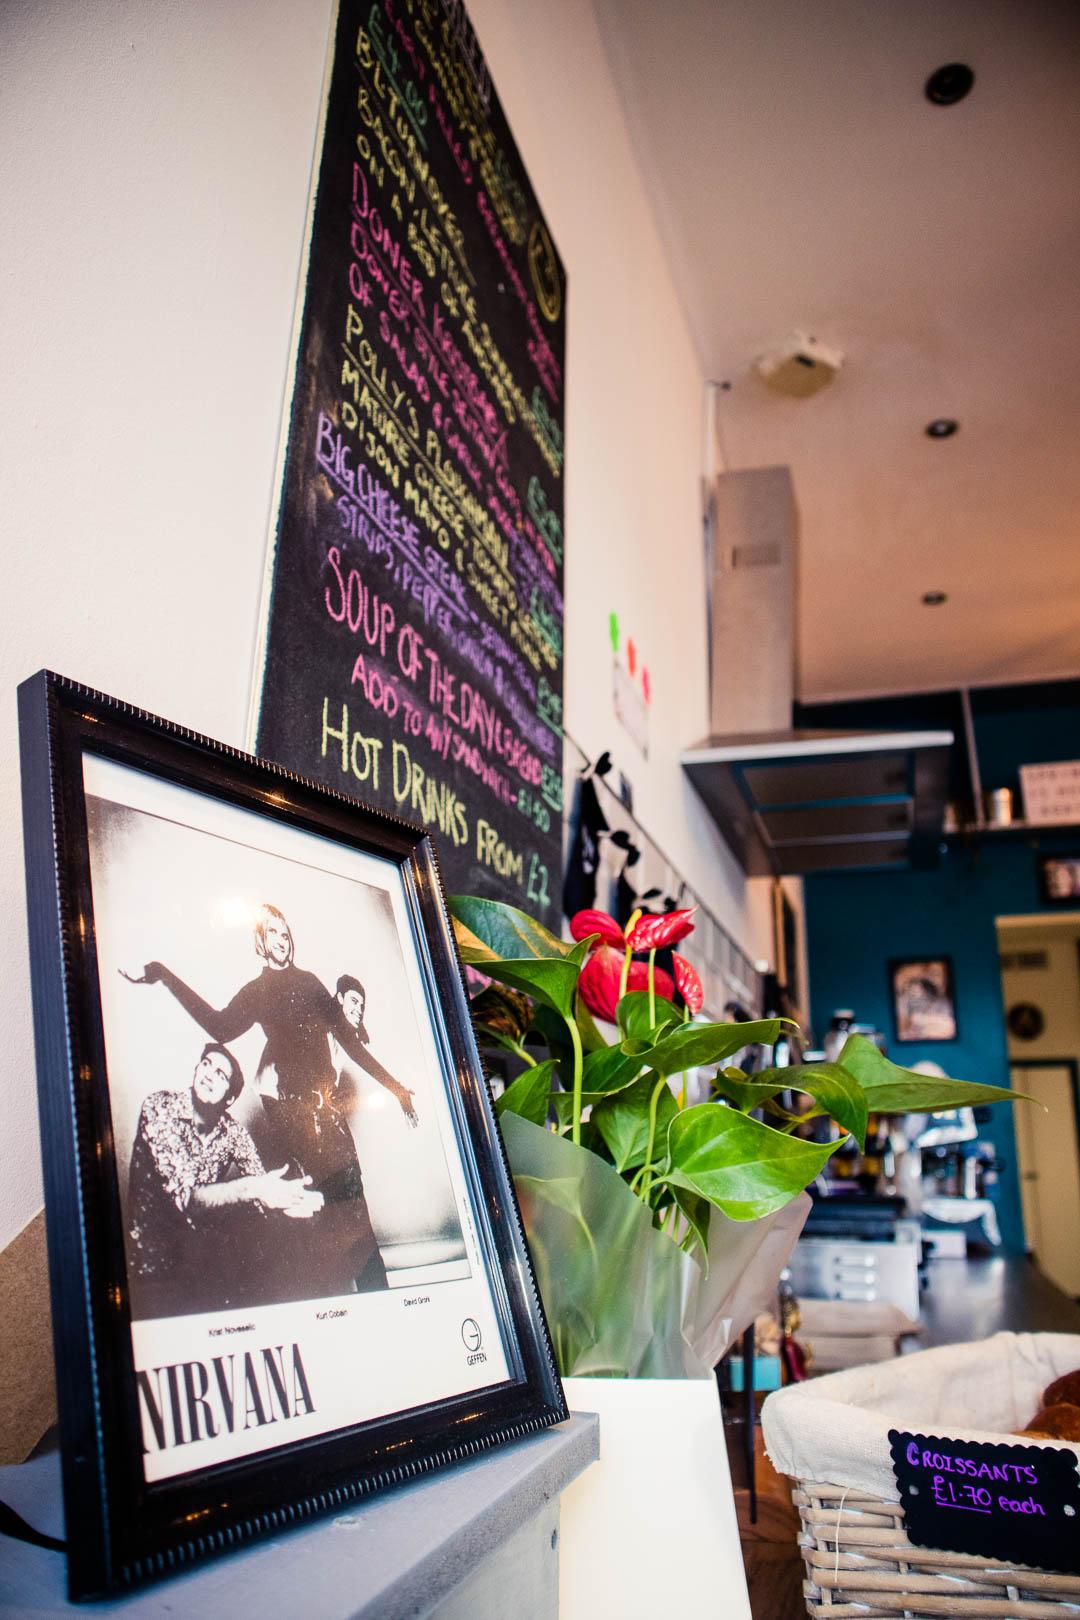 Nirvana memorabilia decorates all of In Bloom Glasgow.